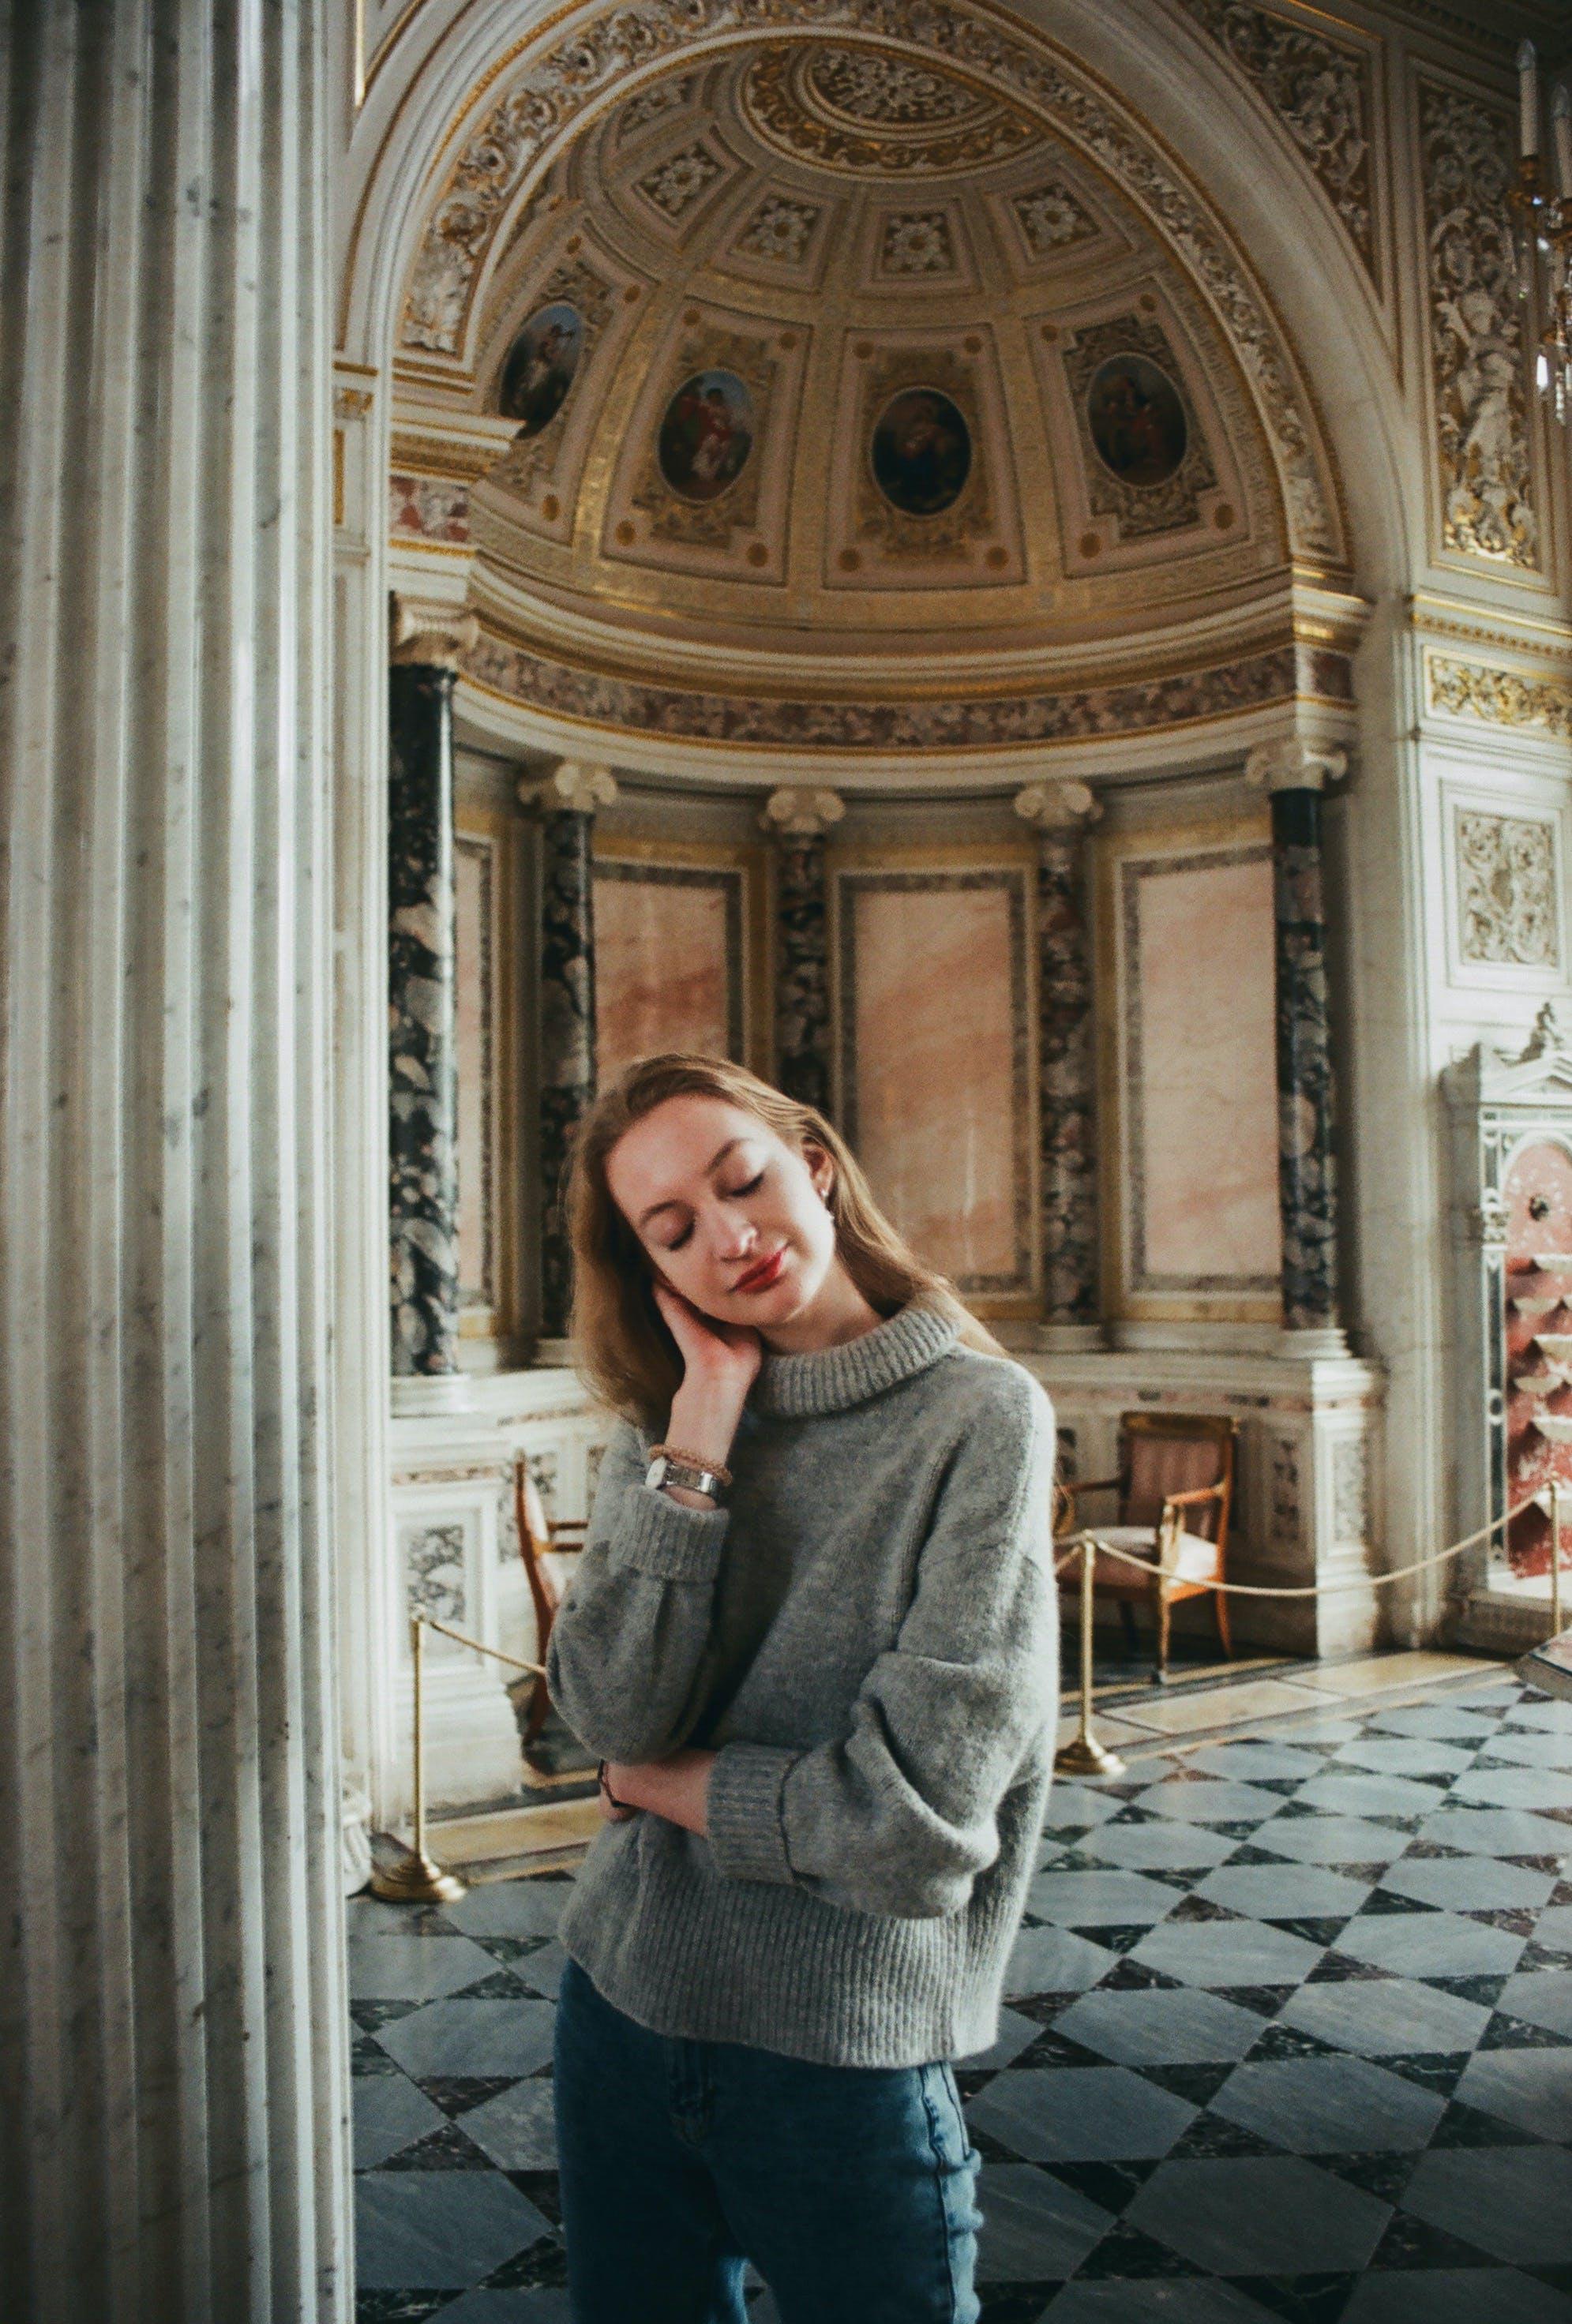 Woman in Gray Turtle-neck Sweater Near White Concrete Pillar